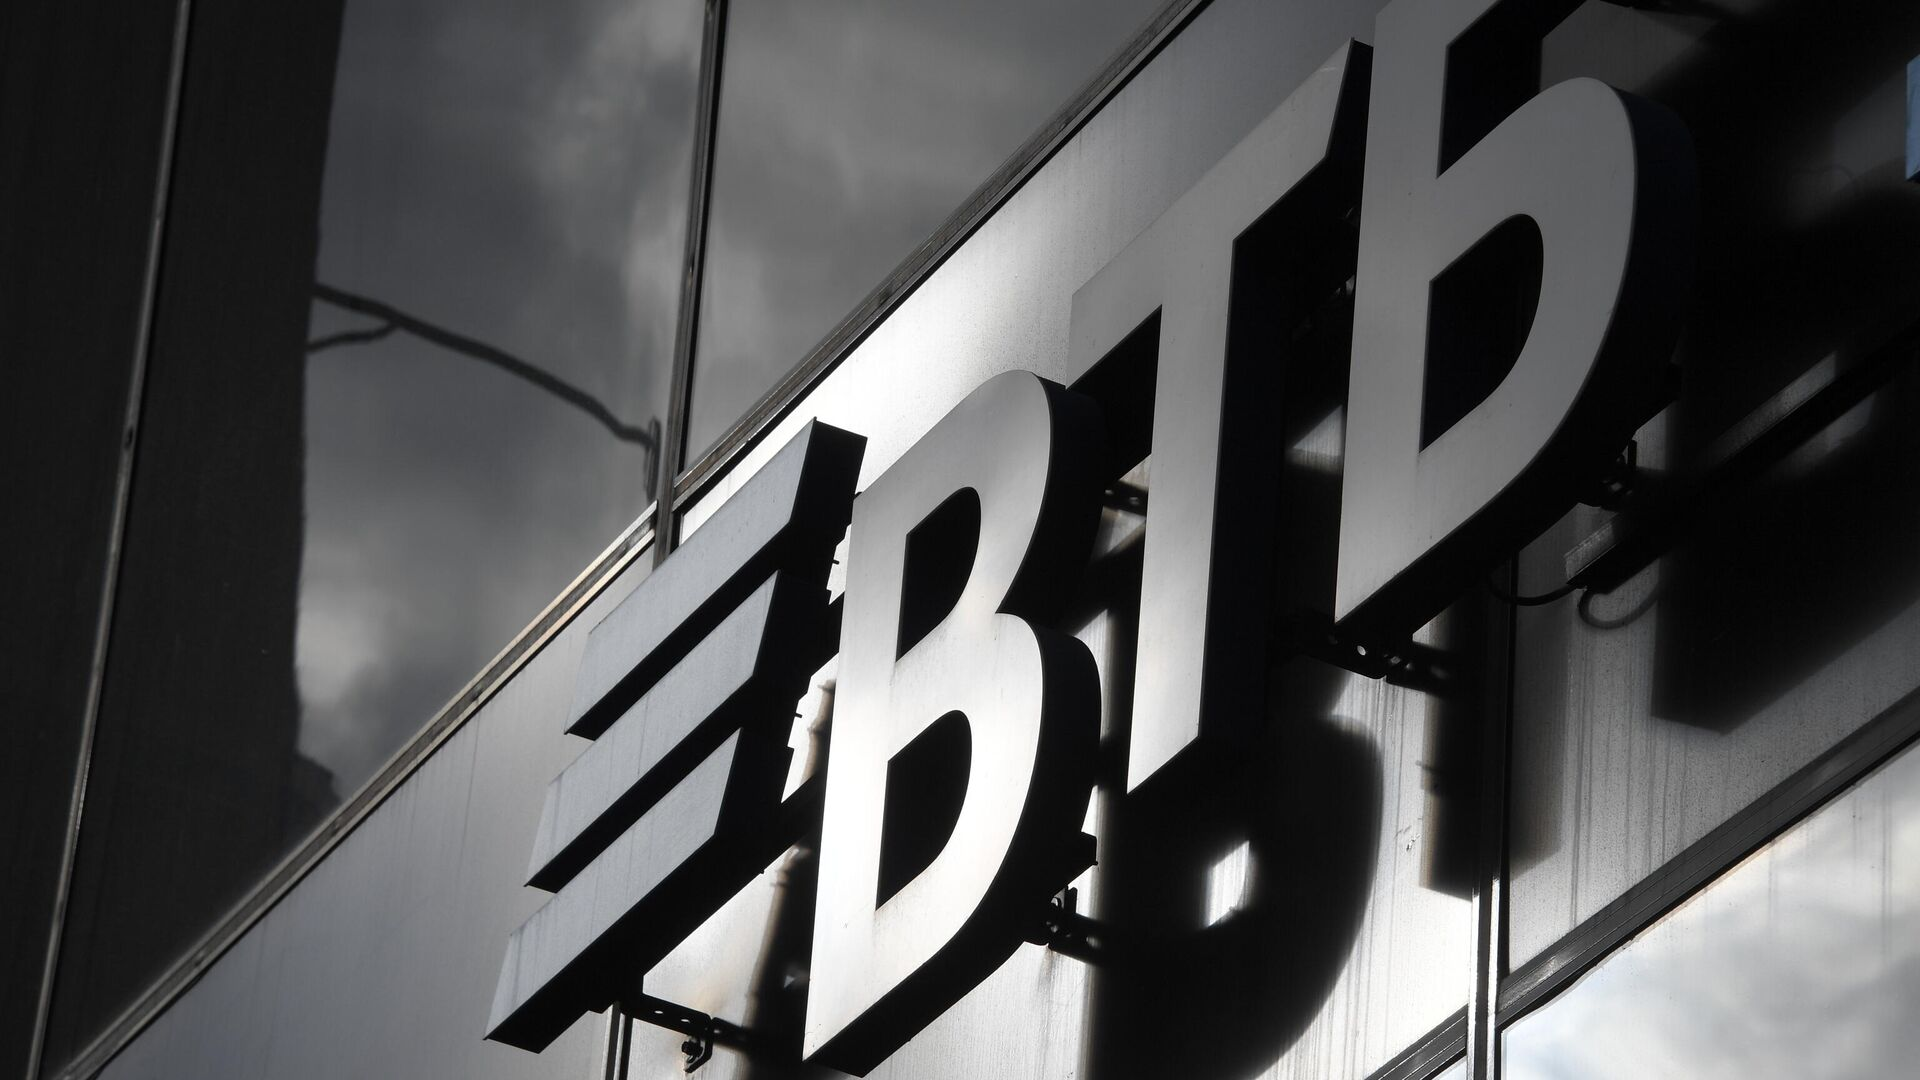 1568920102 0:160:3072:1888 1920x0 80 0 0 4159b1a5e04cab3812ff18c9e612adc1 - ВТБ занял второе место в рейтинге цифровизации банков